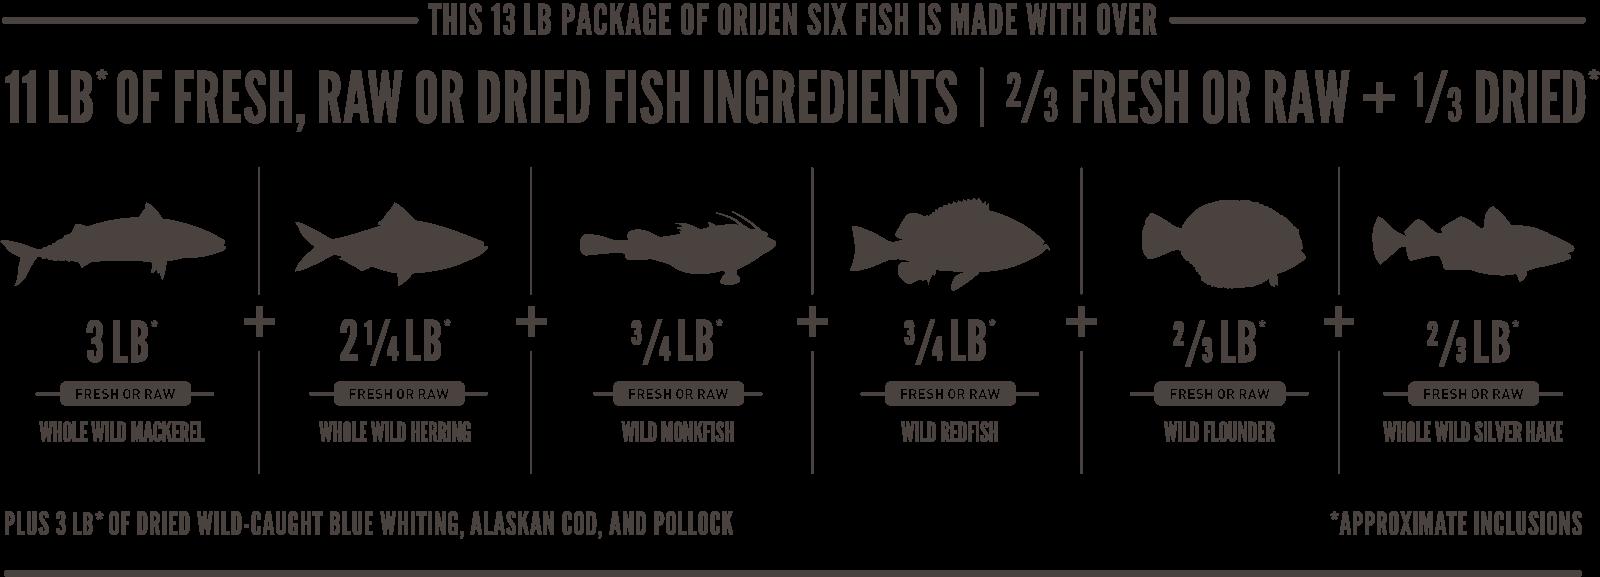 ORIJEN Six Fish Meatmath Formula and Dog Food Ingredients